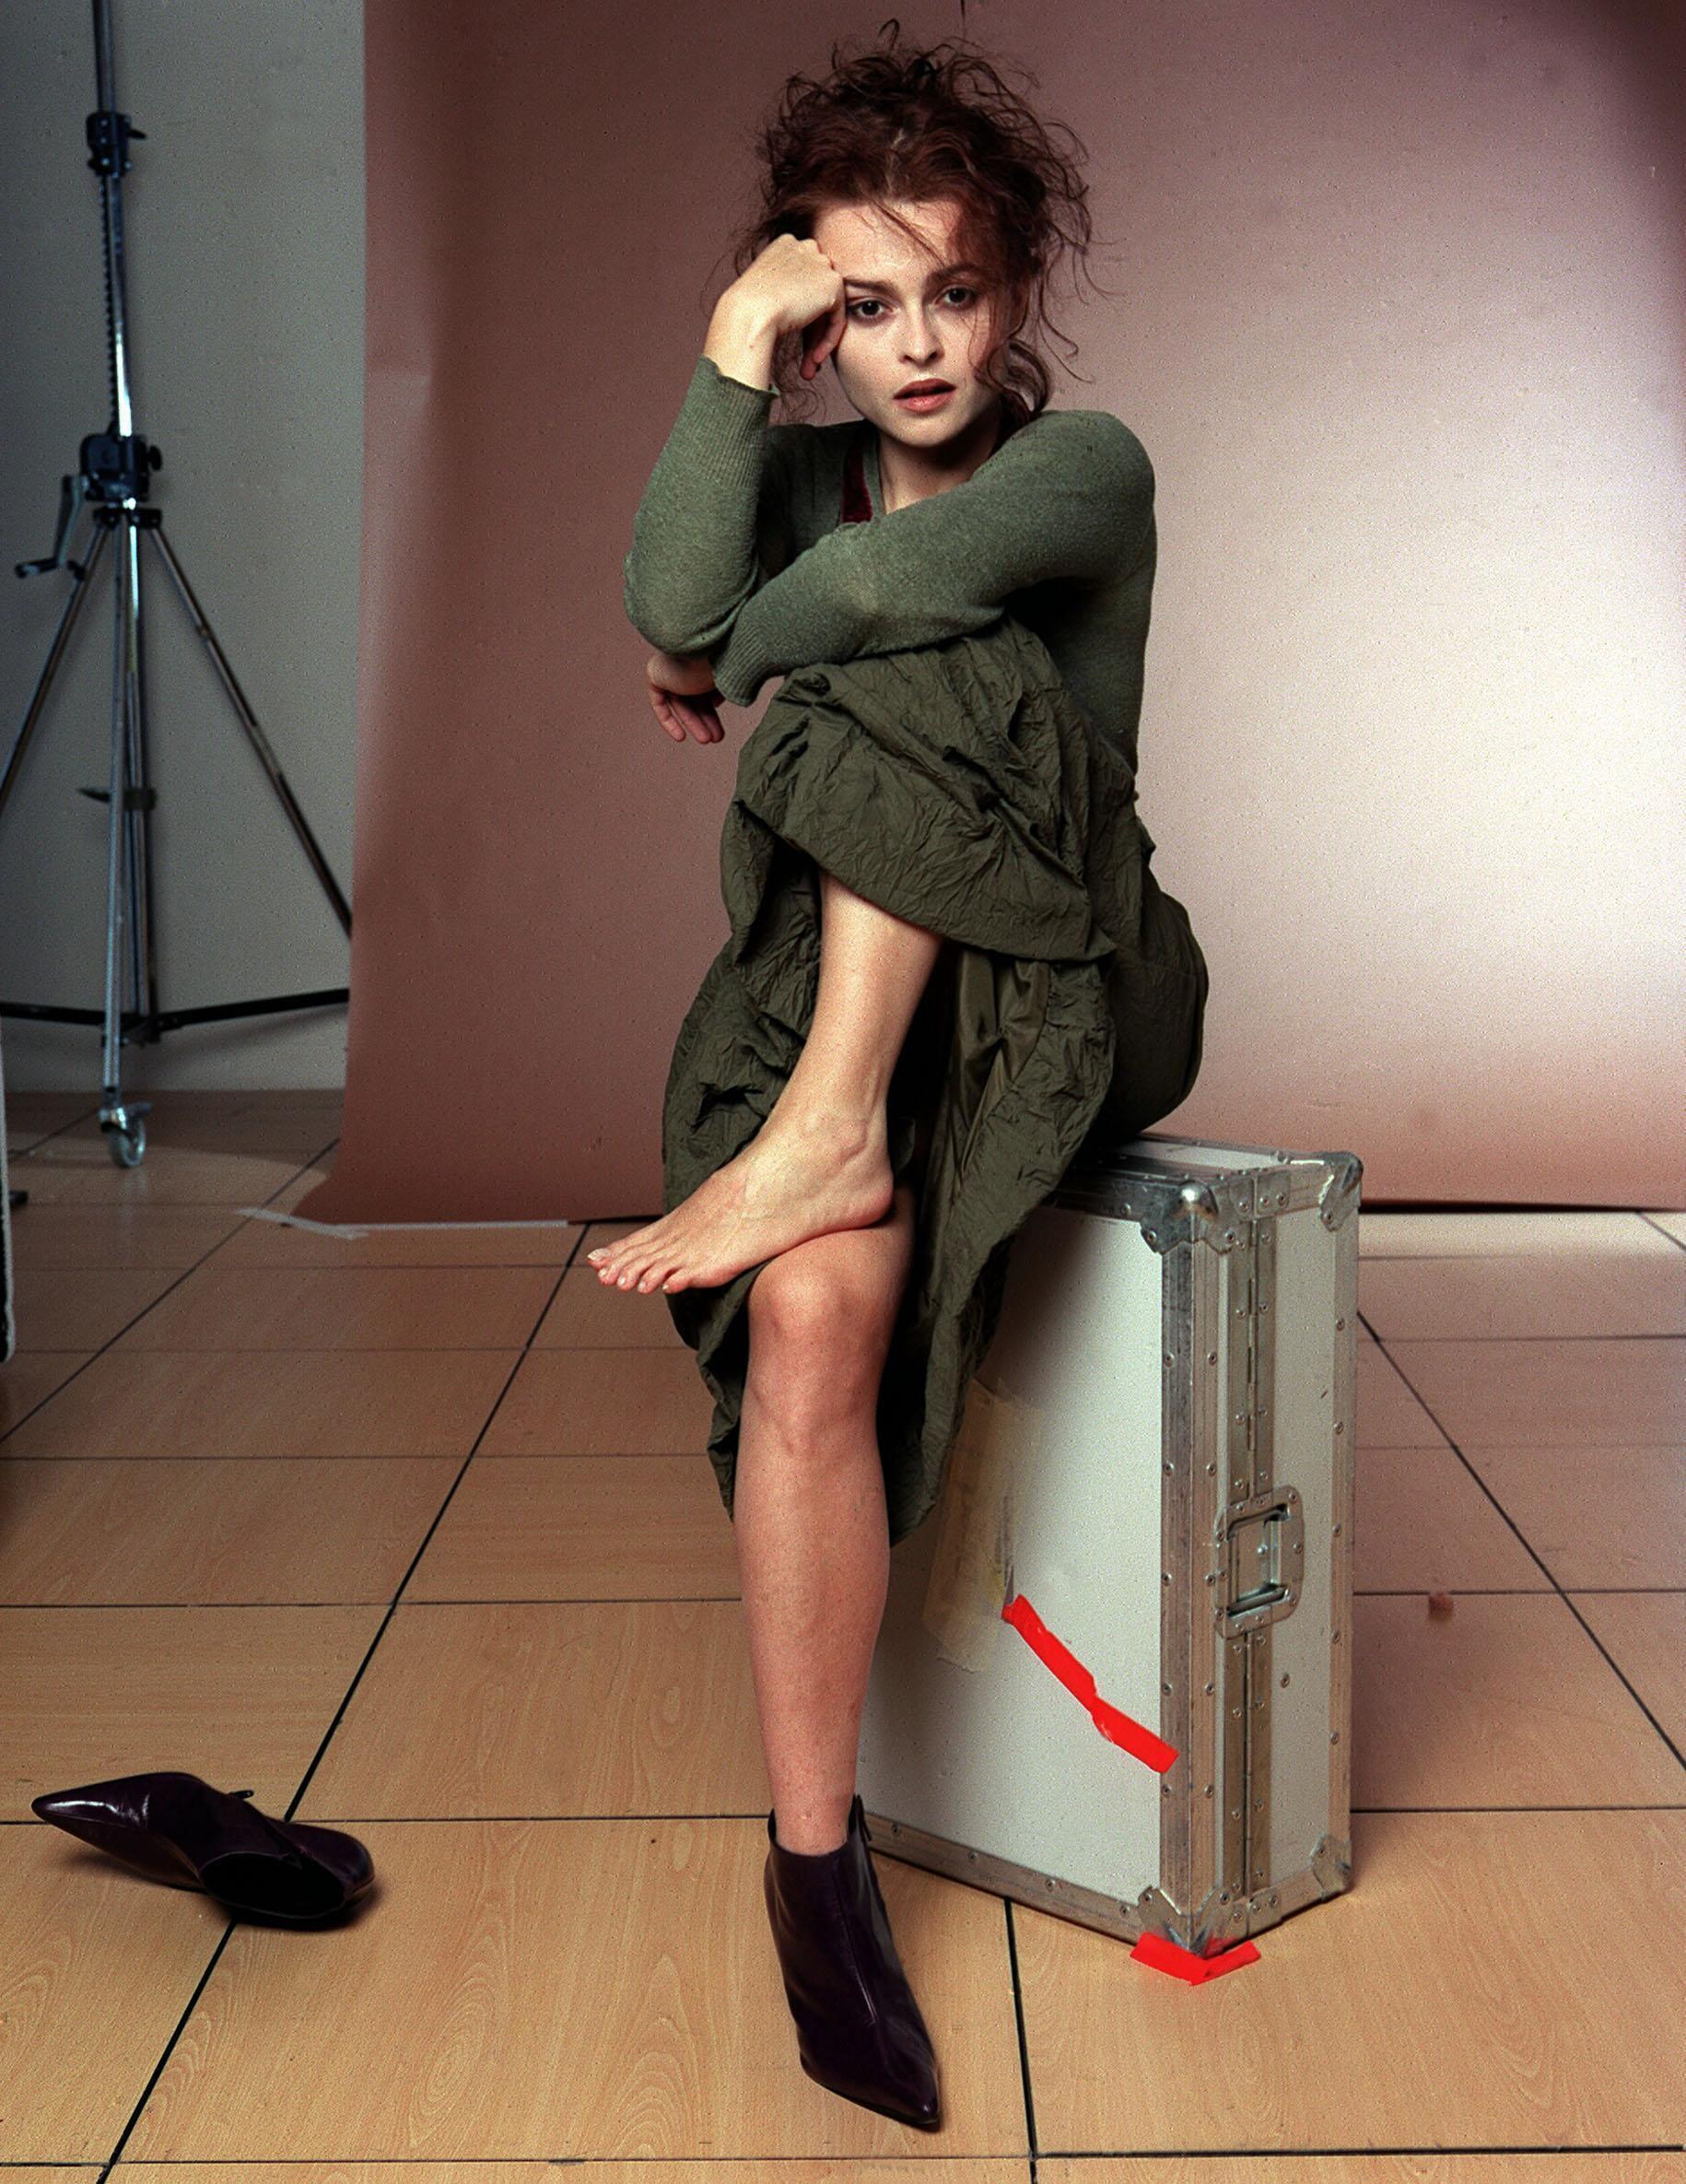 Helena Bonham Carter images Helena ♥ HD wallpaper and background ... Helena Bonham Carter